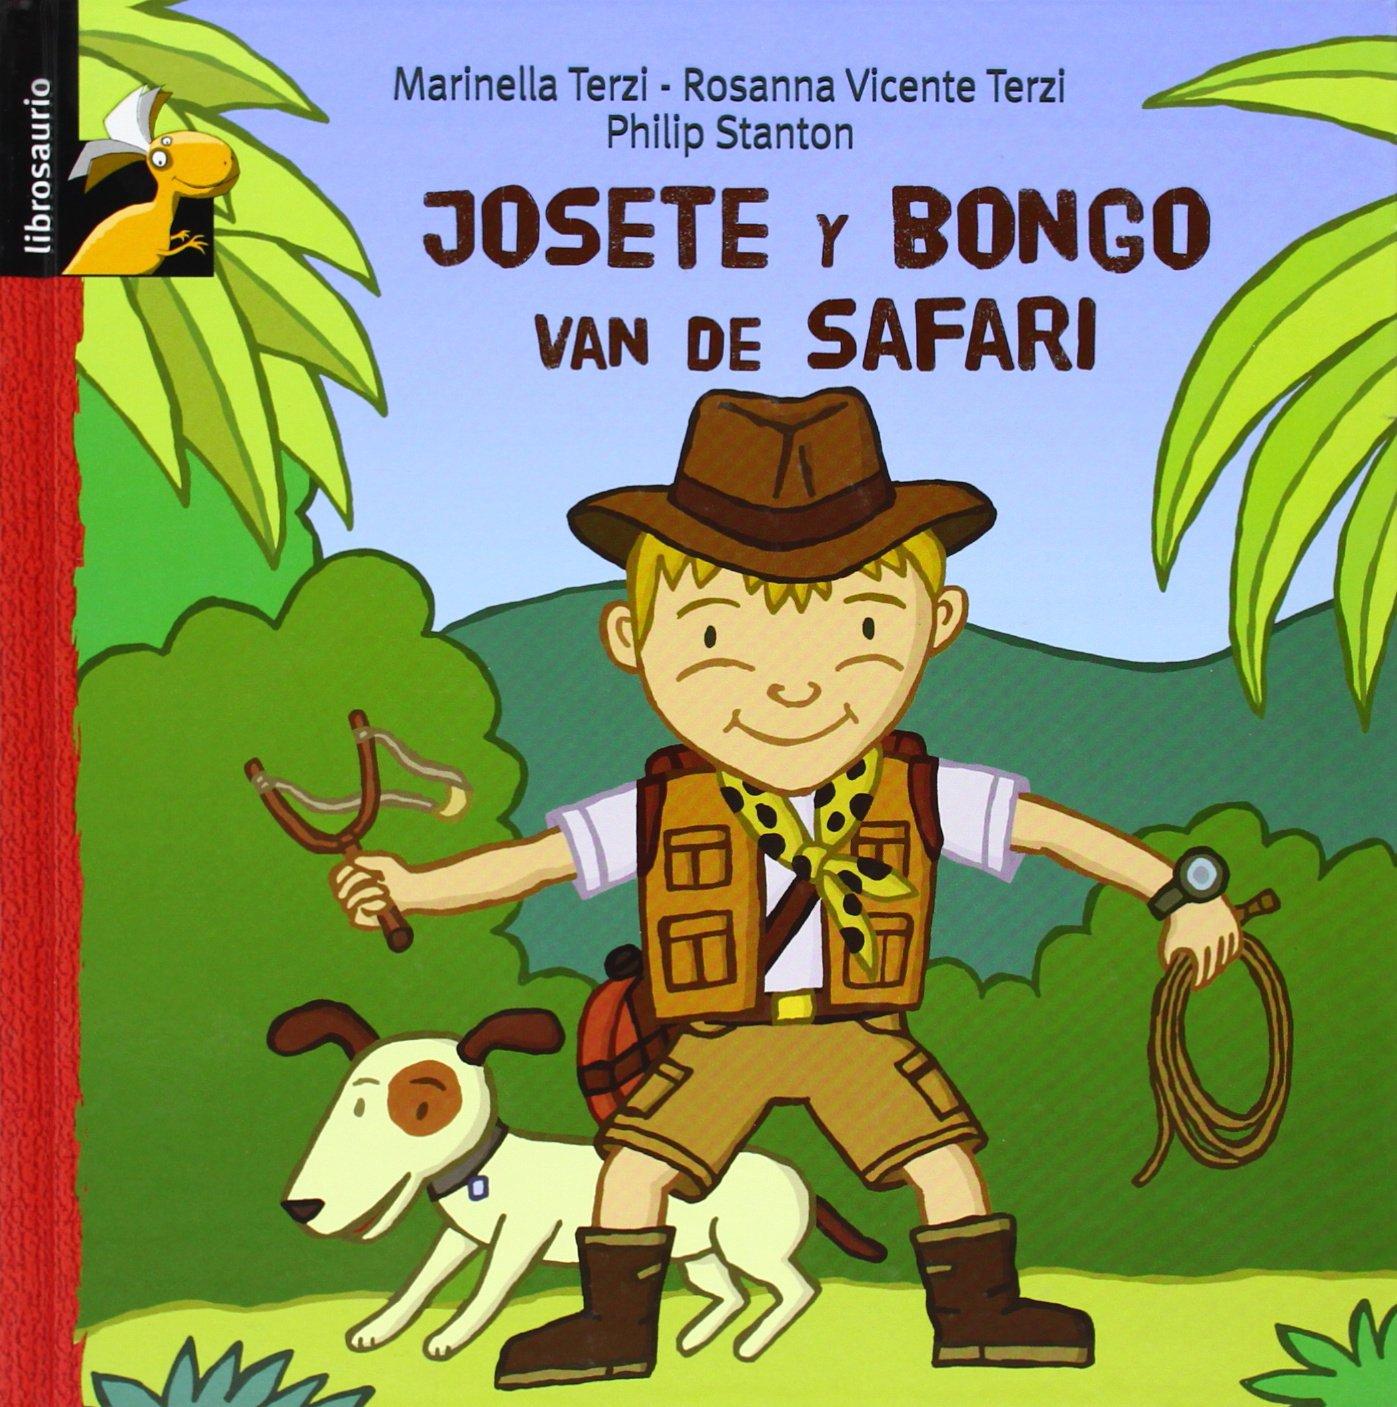 josete y bongo van de safari Marinella Terzi